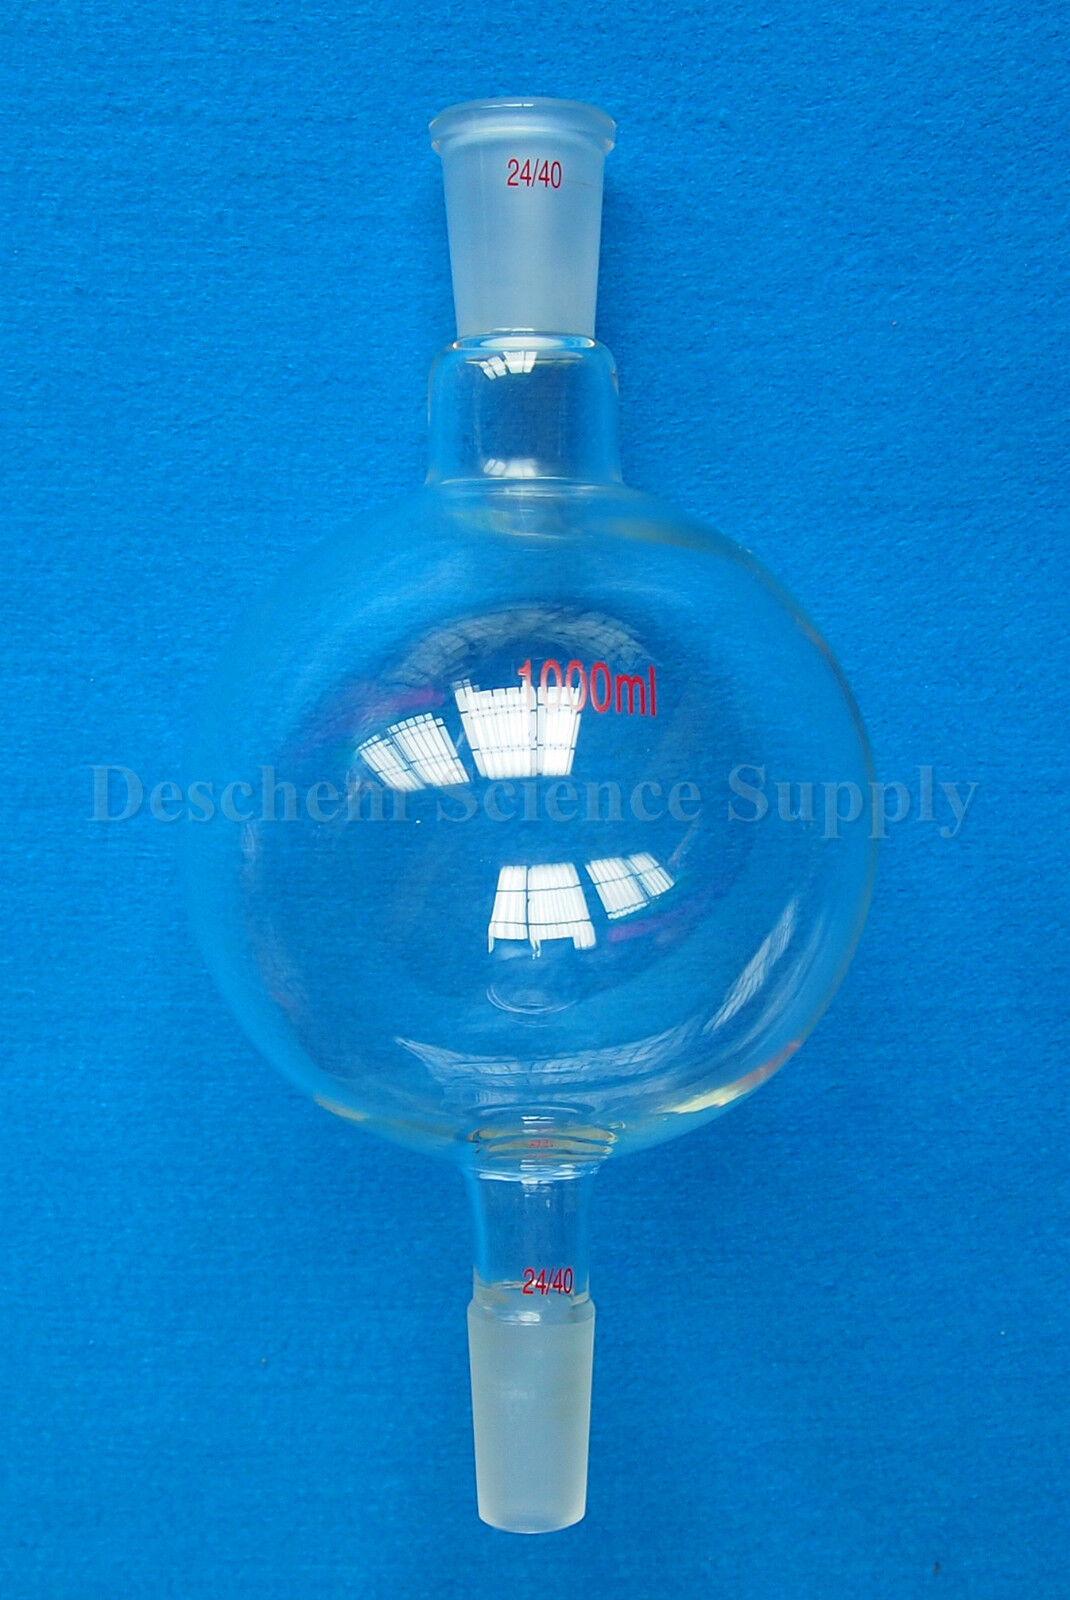 1000ml,24/40,Chromatography Reservoir Glass Flask,1 Litre,My-Glassware 2